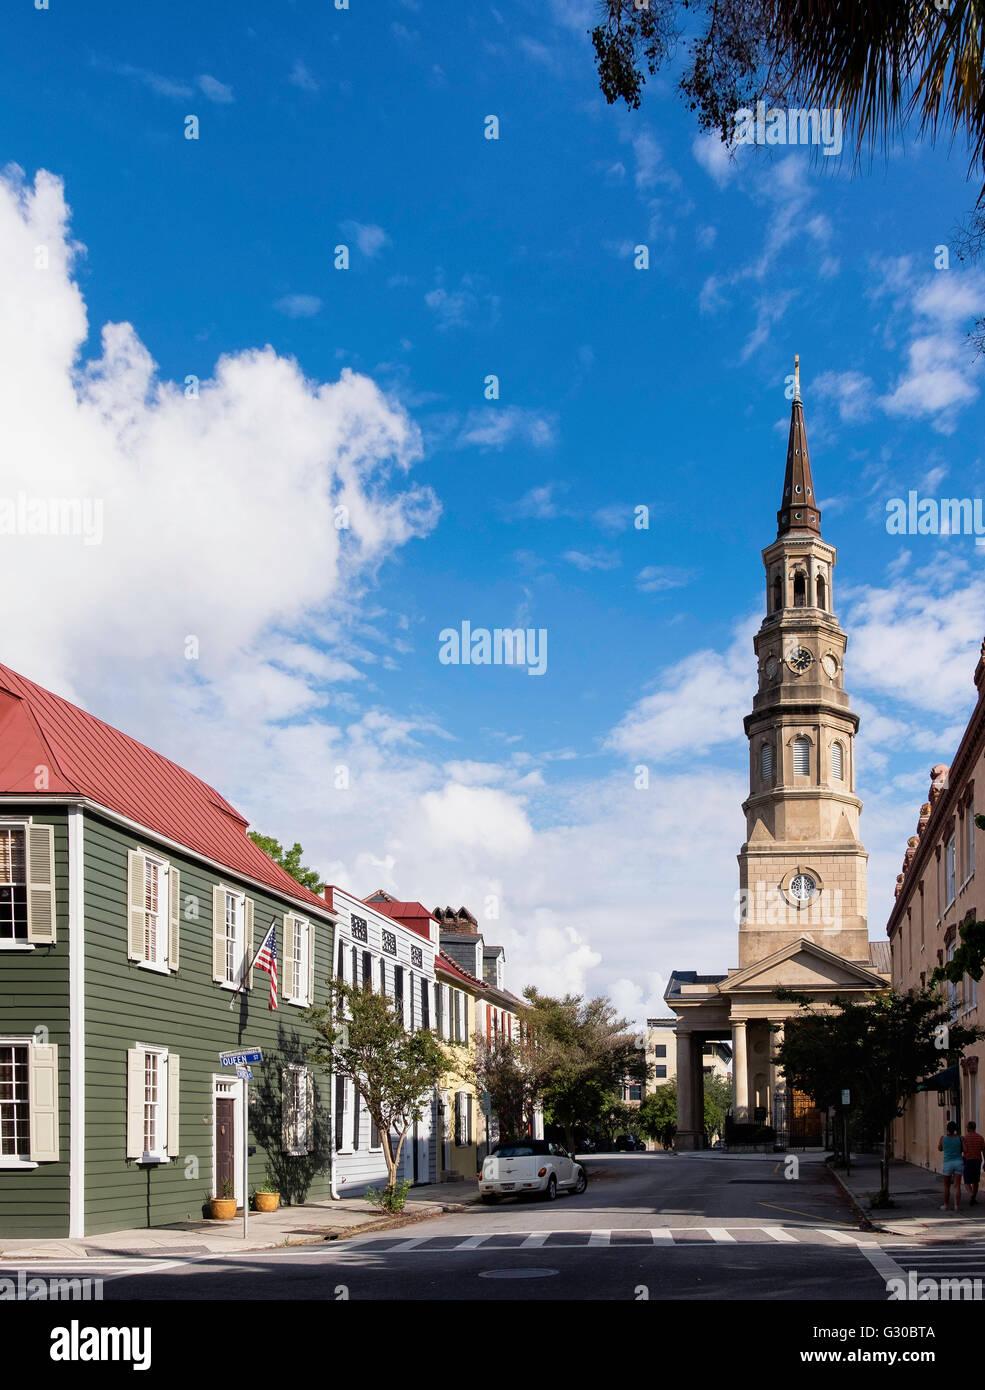 View towards St. Philip's Episcopal Church on Church Street, Charleston, South Carolina, United States of America, - Stock Image